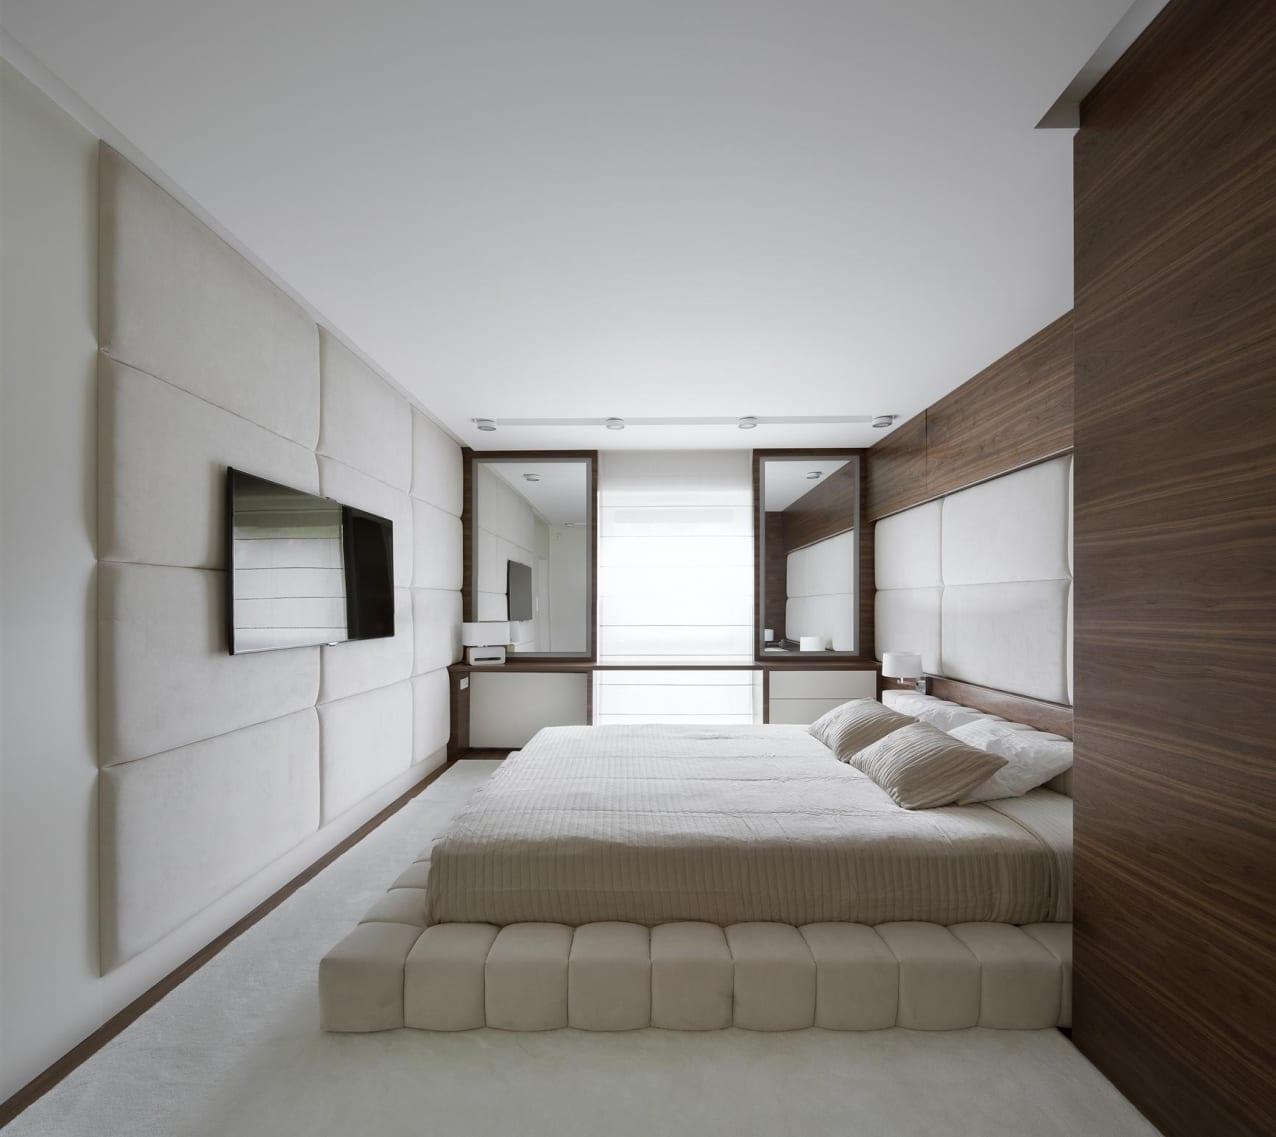 Tv wandpaneel wei von hola design freshouse - Wandpaneel balkon ...